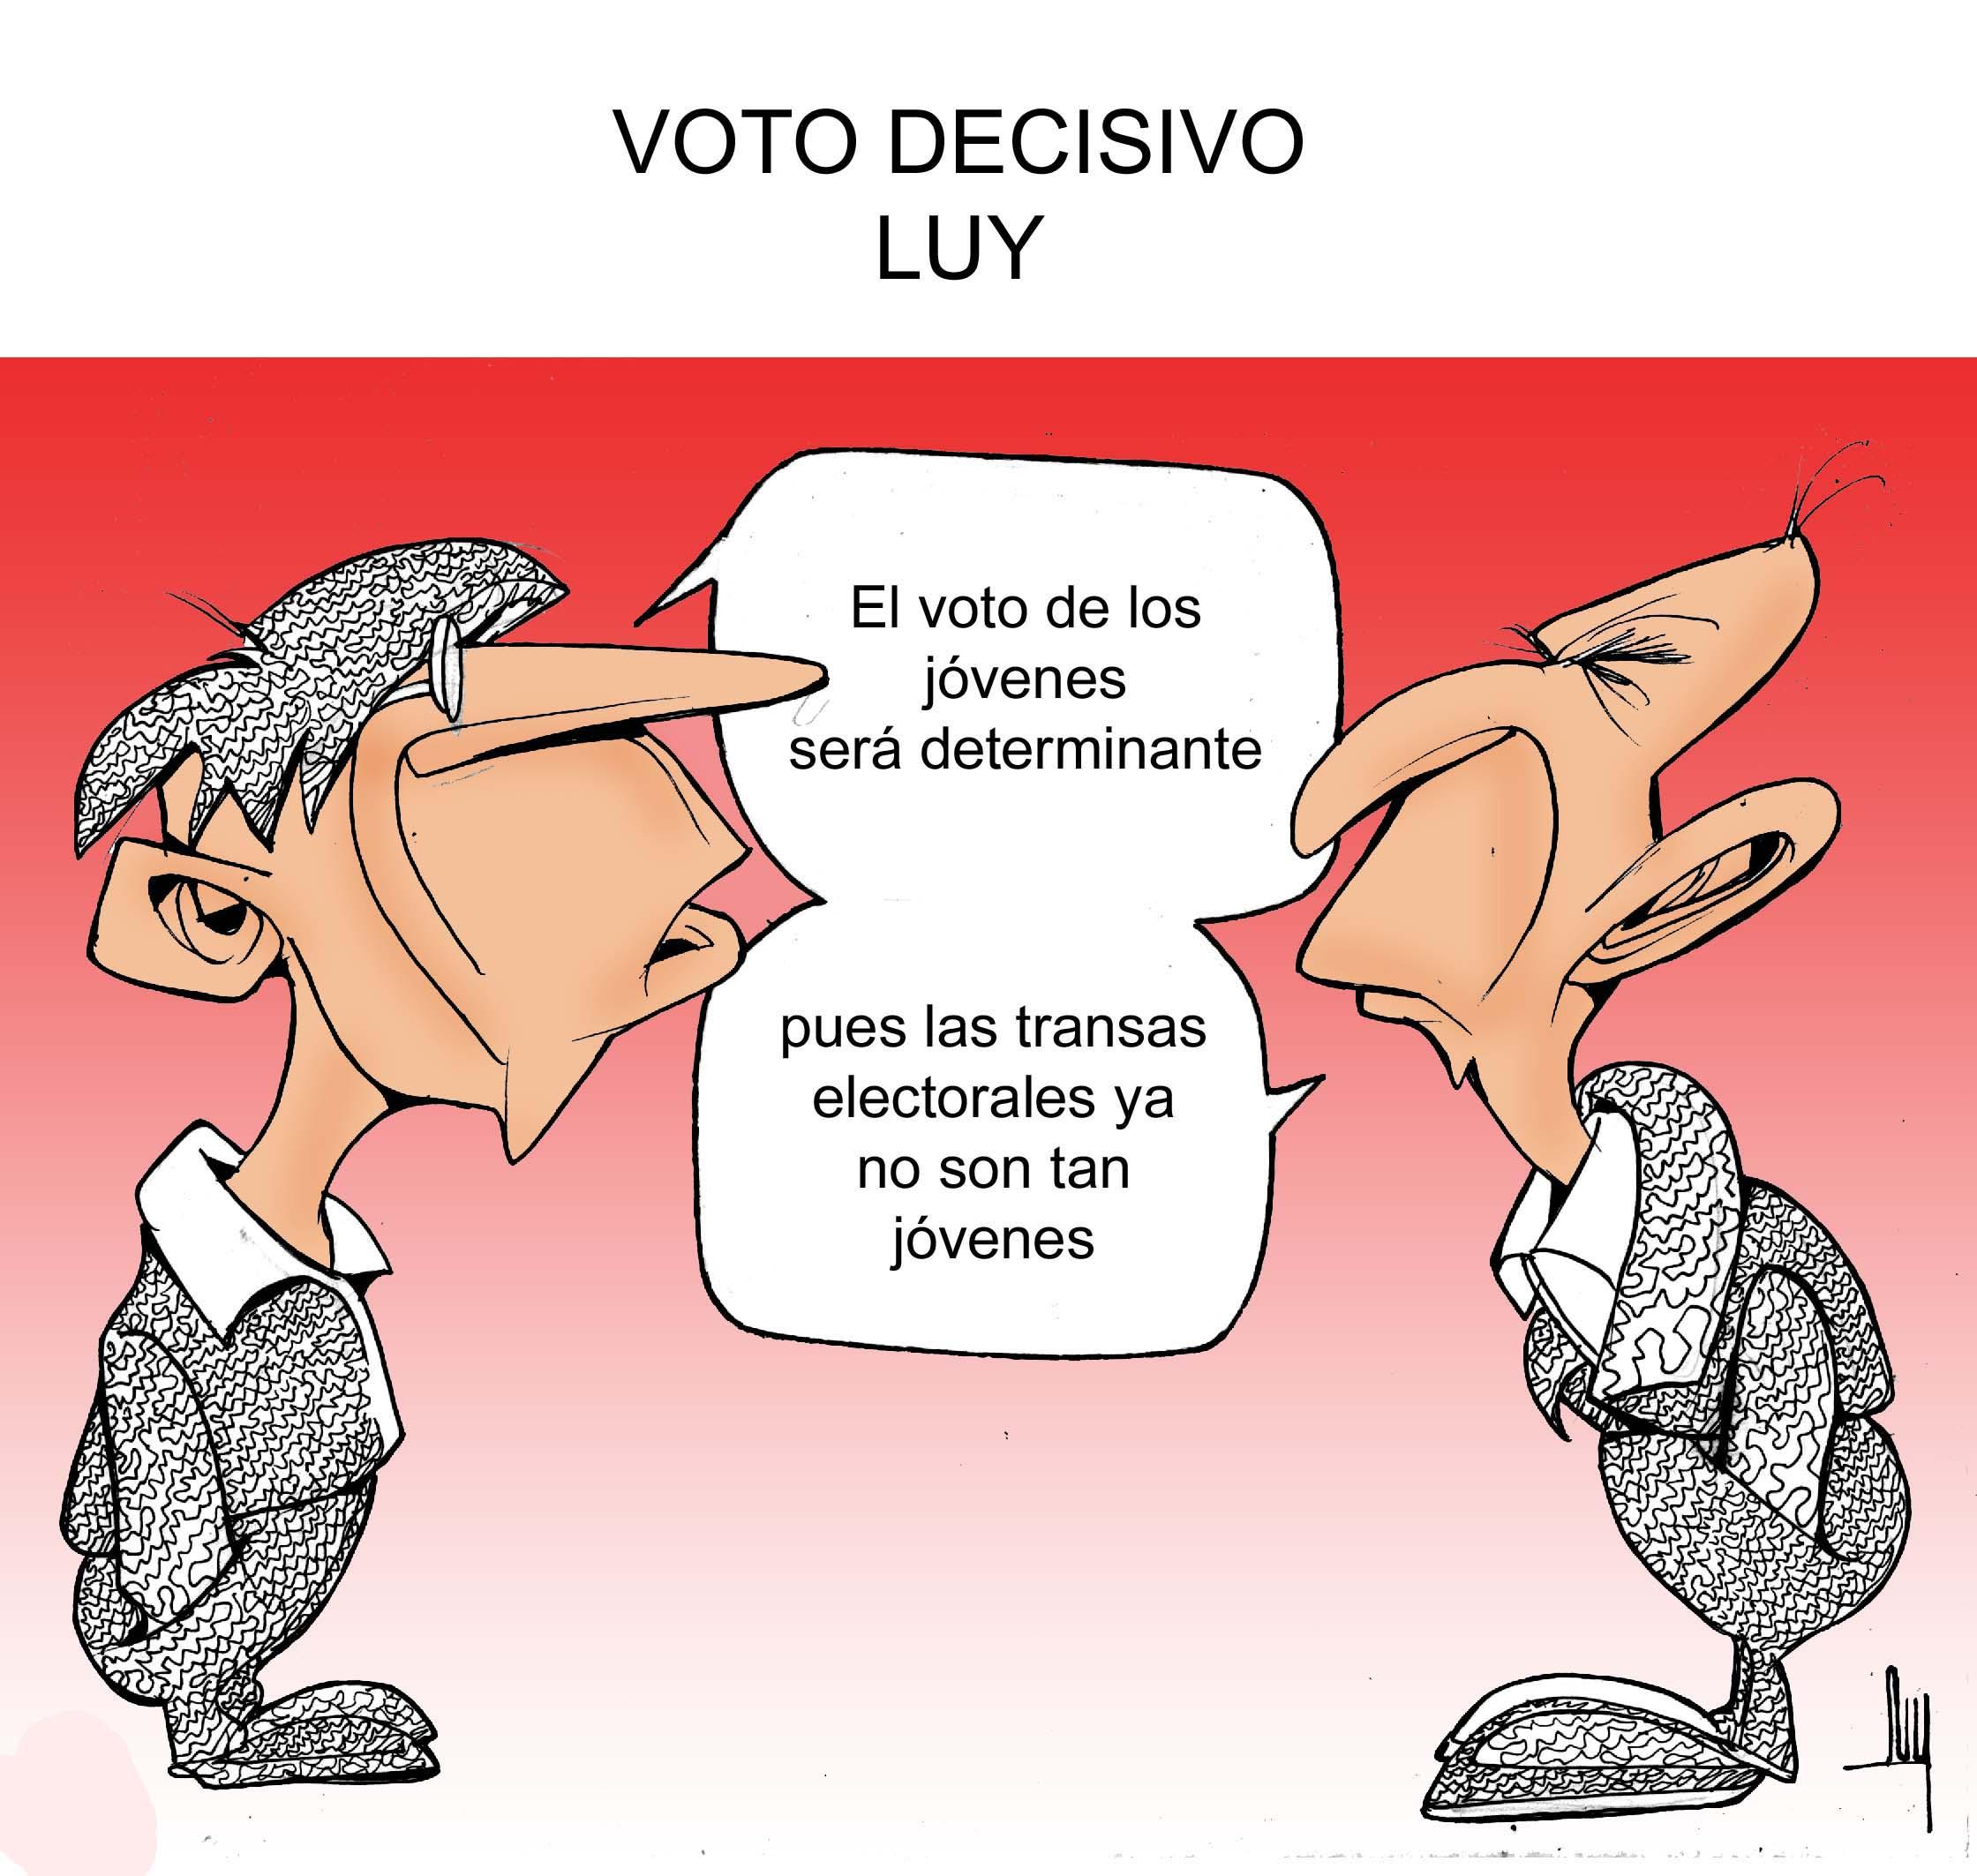 voto-decisivo